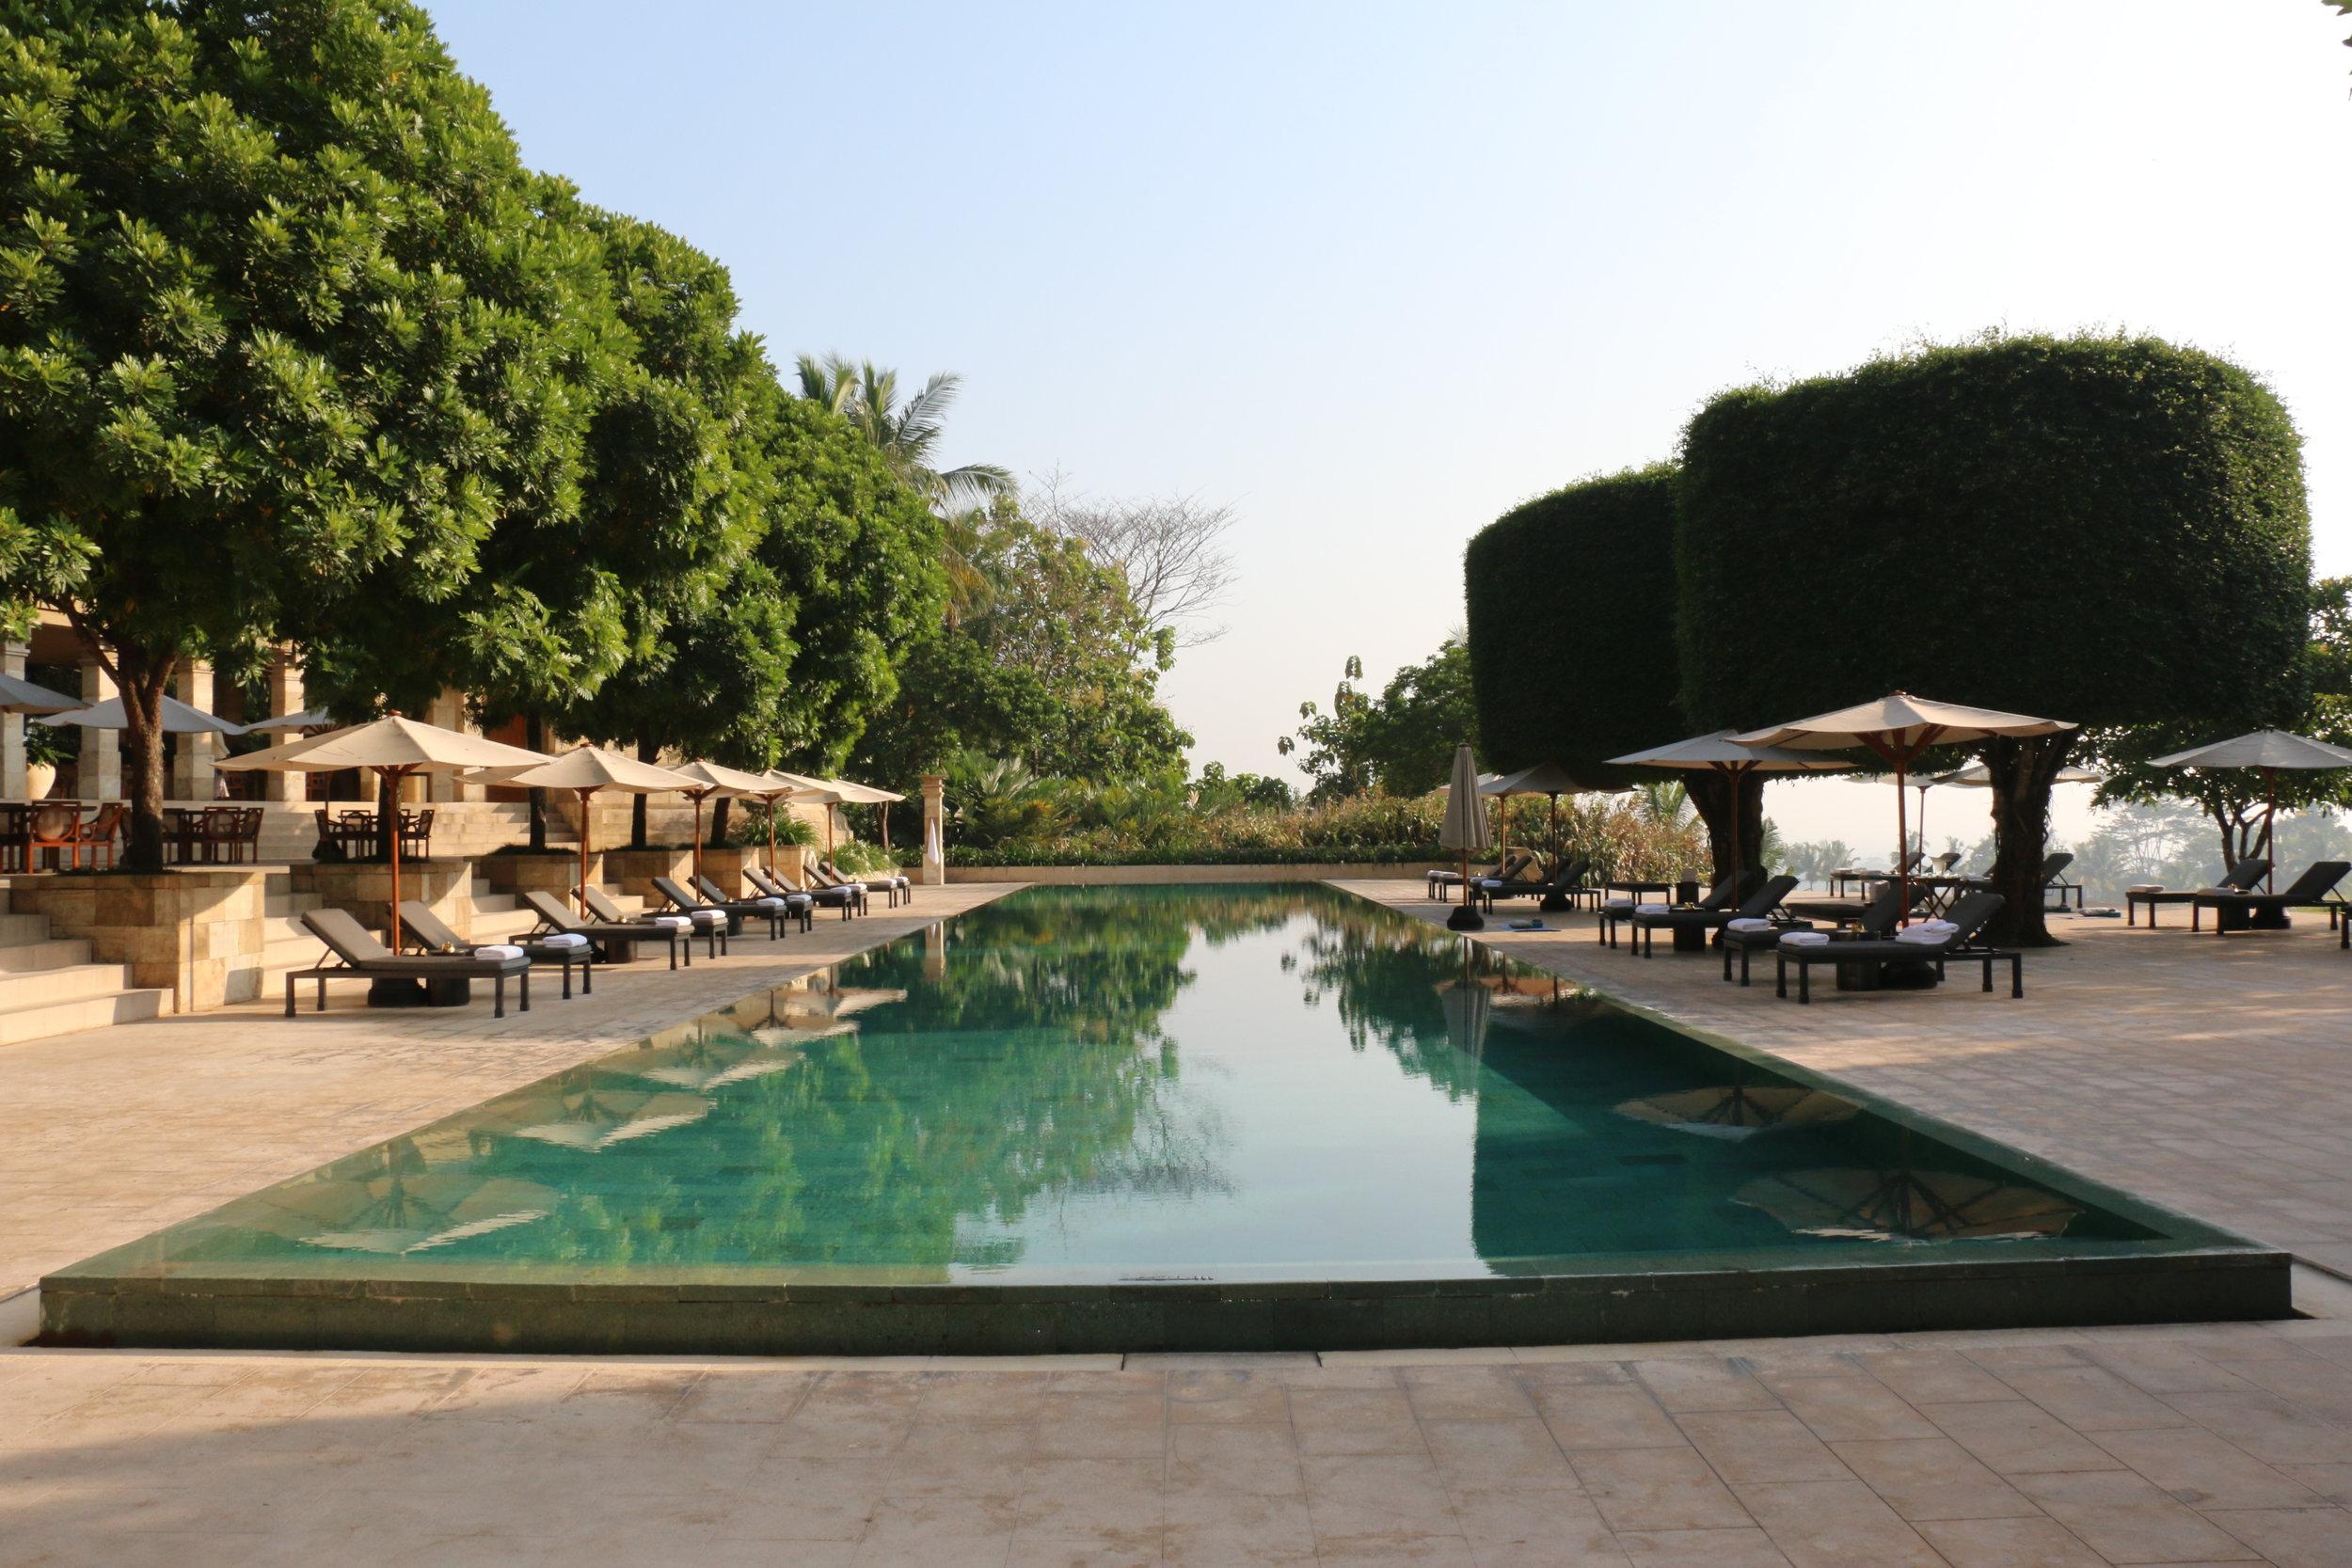 The main pool at Amanjiwo.